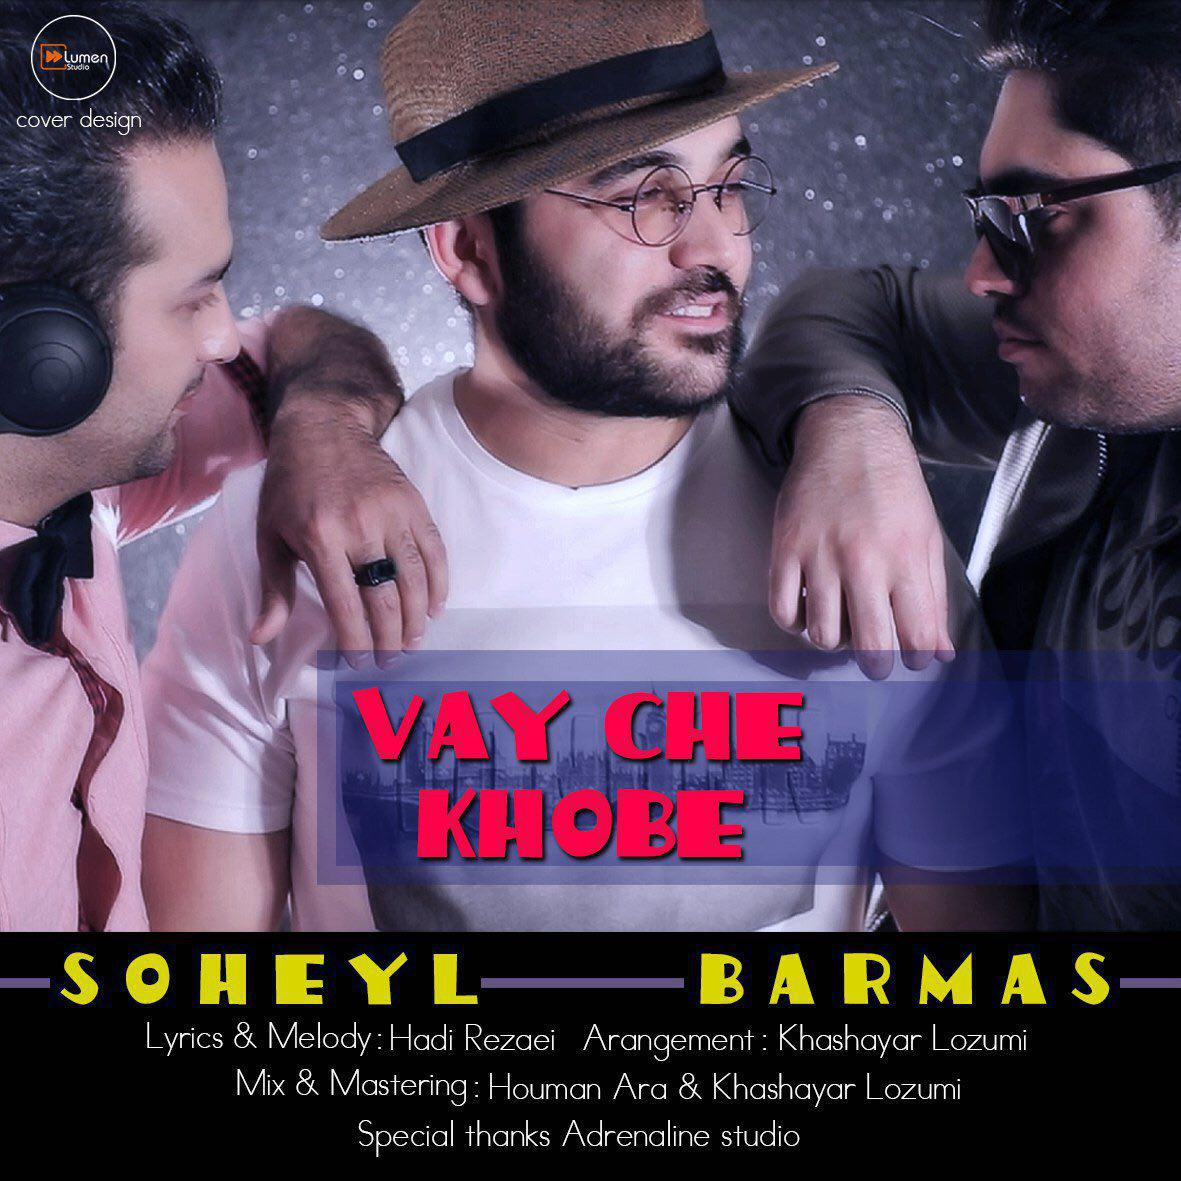 Soheil Barmas – Vay Che Khobeh